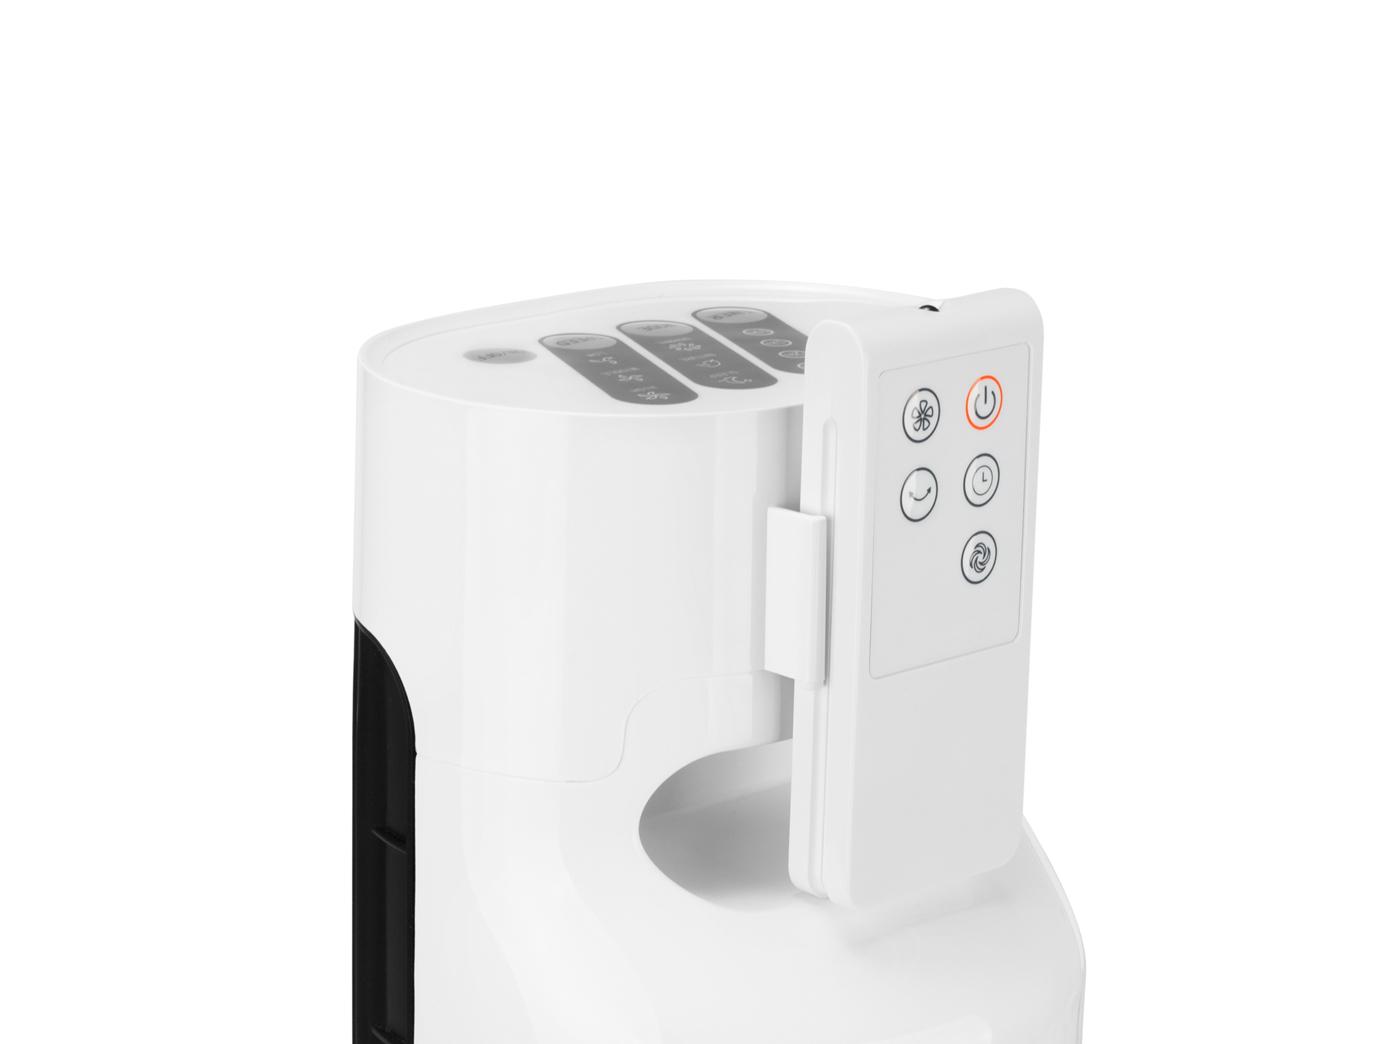 tower ventilator mit timer fernbedienung 3 stufen oszillierend turmventilator ebay. Black Bedroom Furniture Sets. Home Design Ideas